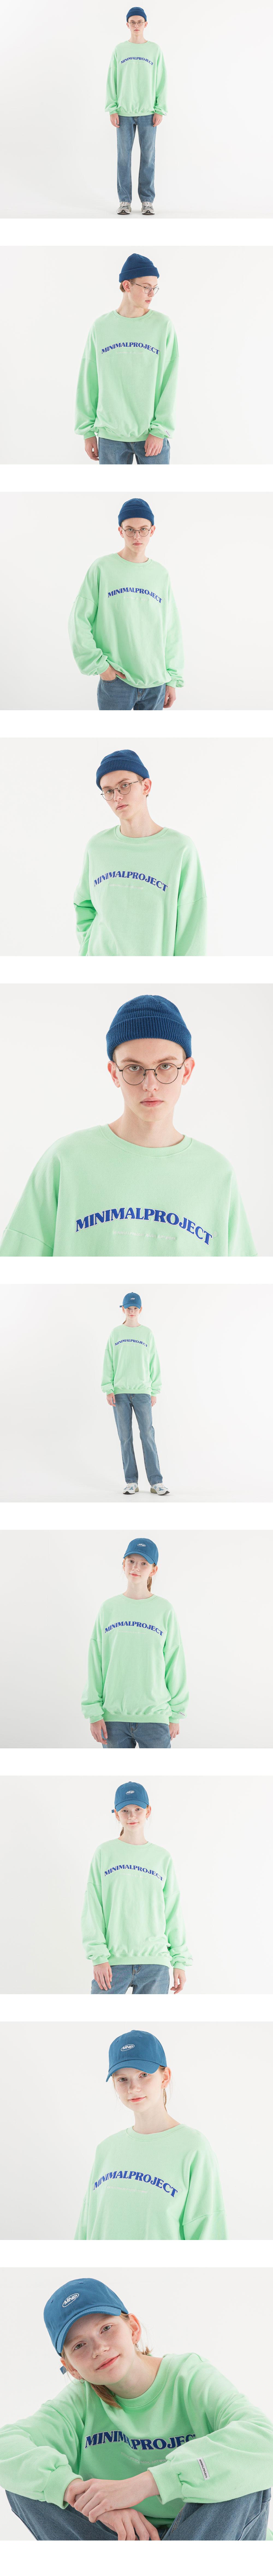 [minimal project] 미니멀프로젝트 아치 자수 오버핏 맨투맨 MMT104 [MELON]